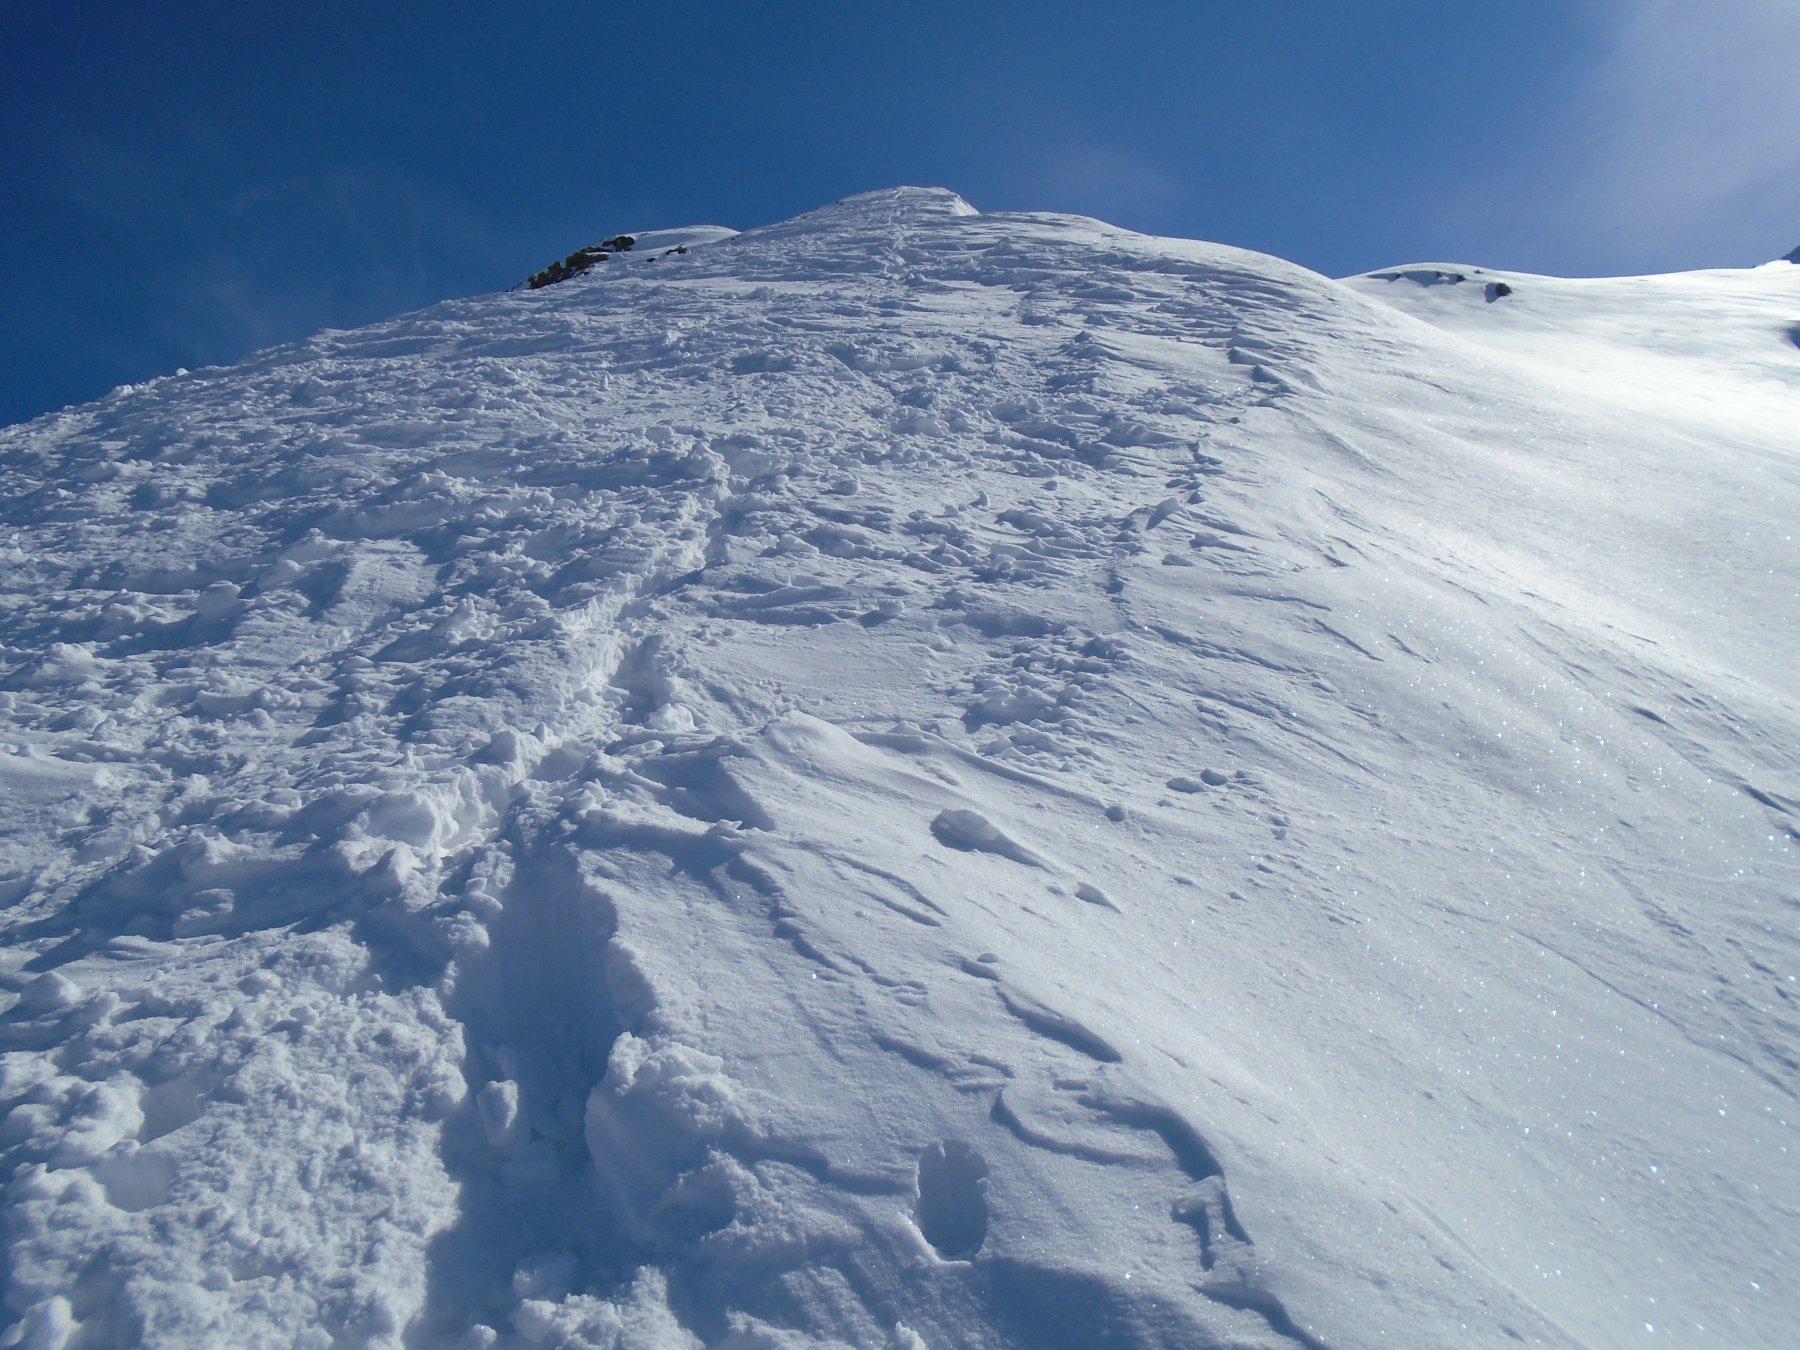 Discesa cresta: ripido, ma neve fresca abbondante e facile